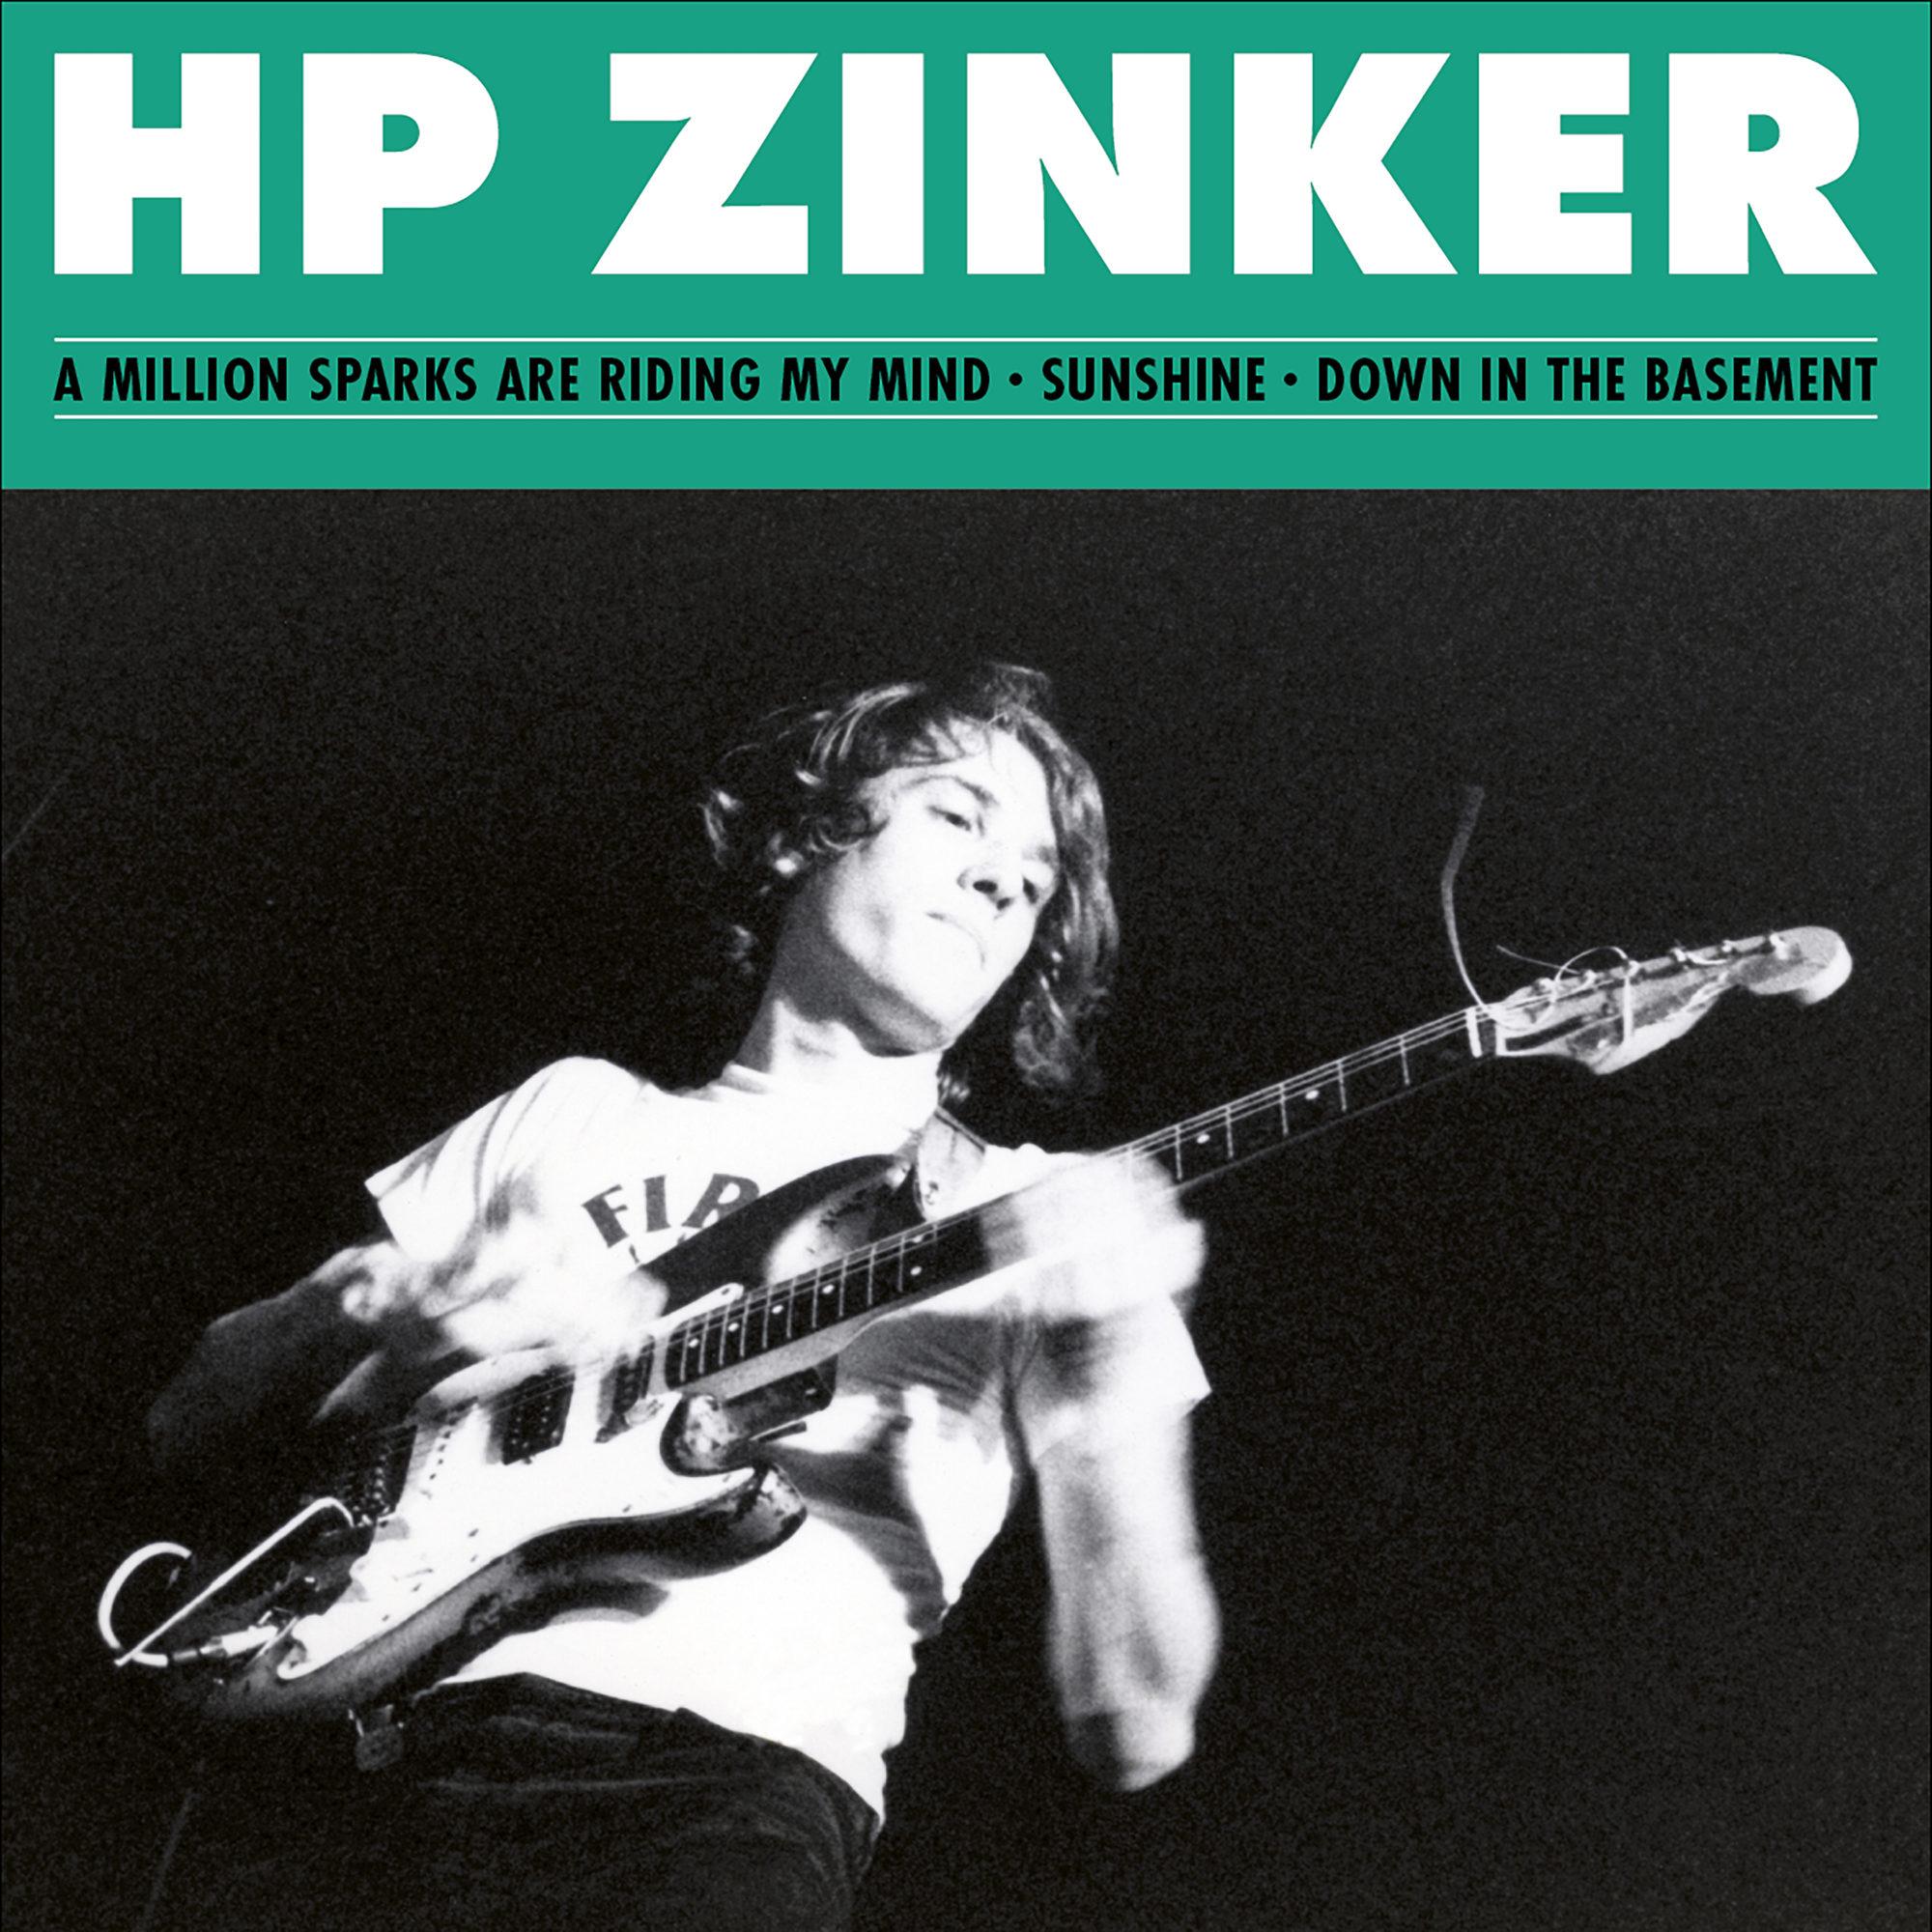 Hp Zinker Band Singlesbox Special Limited Edition Vinyl Austria Platzgumer Artwork